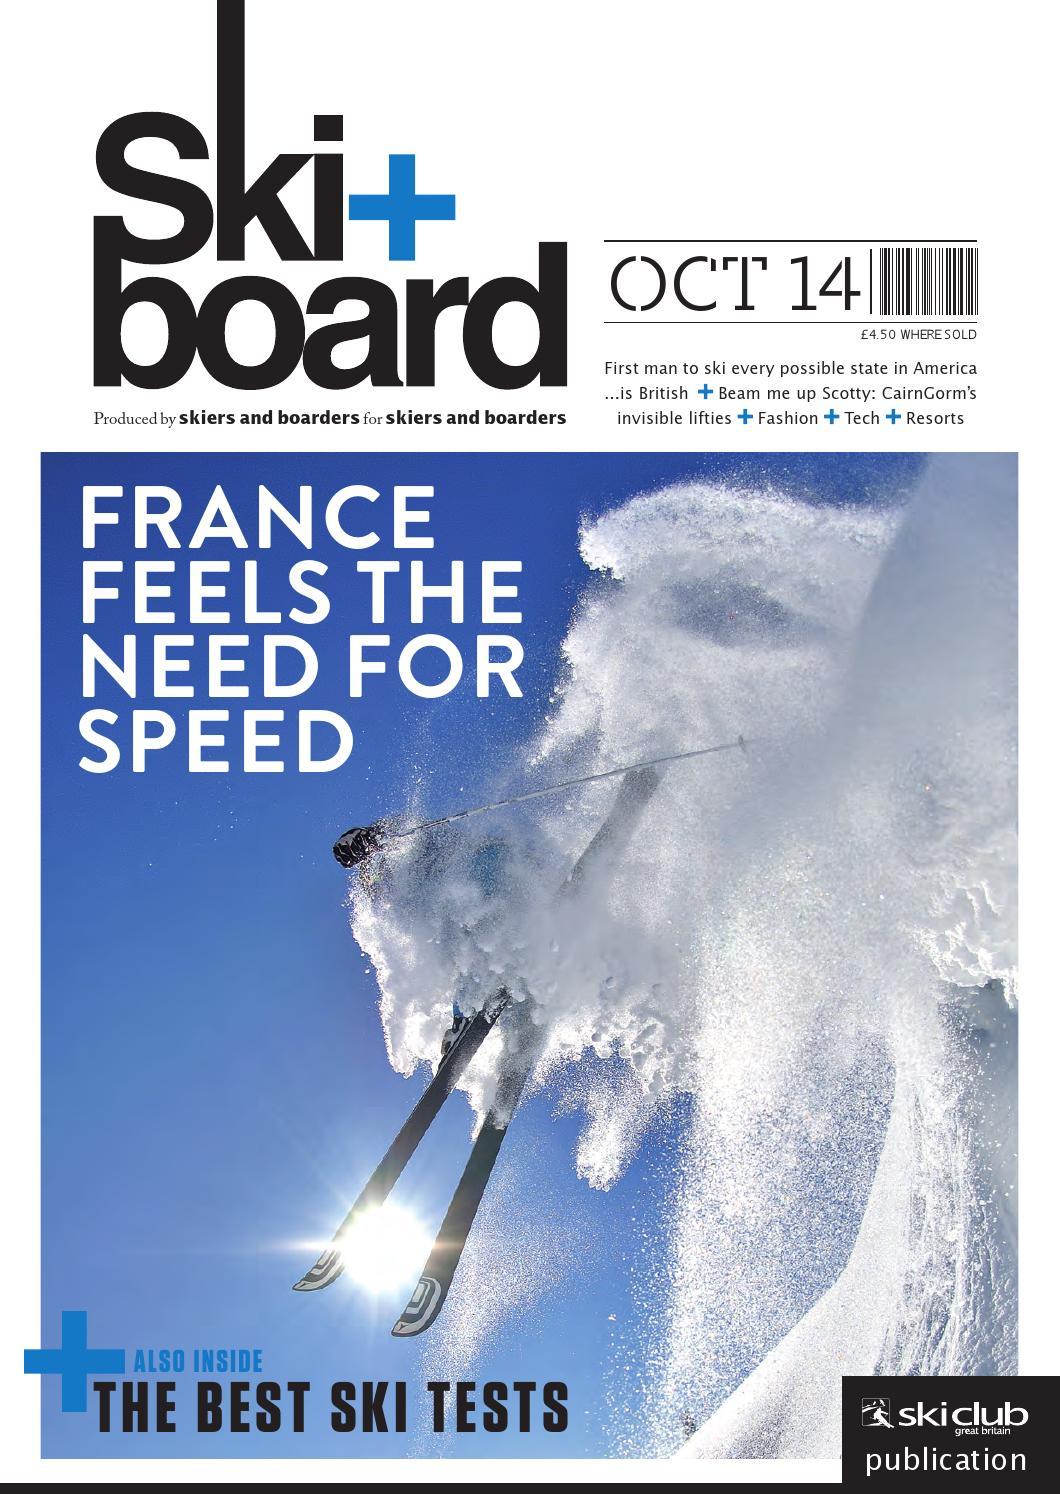 42b79282f63 Ski+board October 2014 by Ski Club of Great Britain - issuu